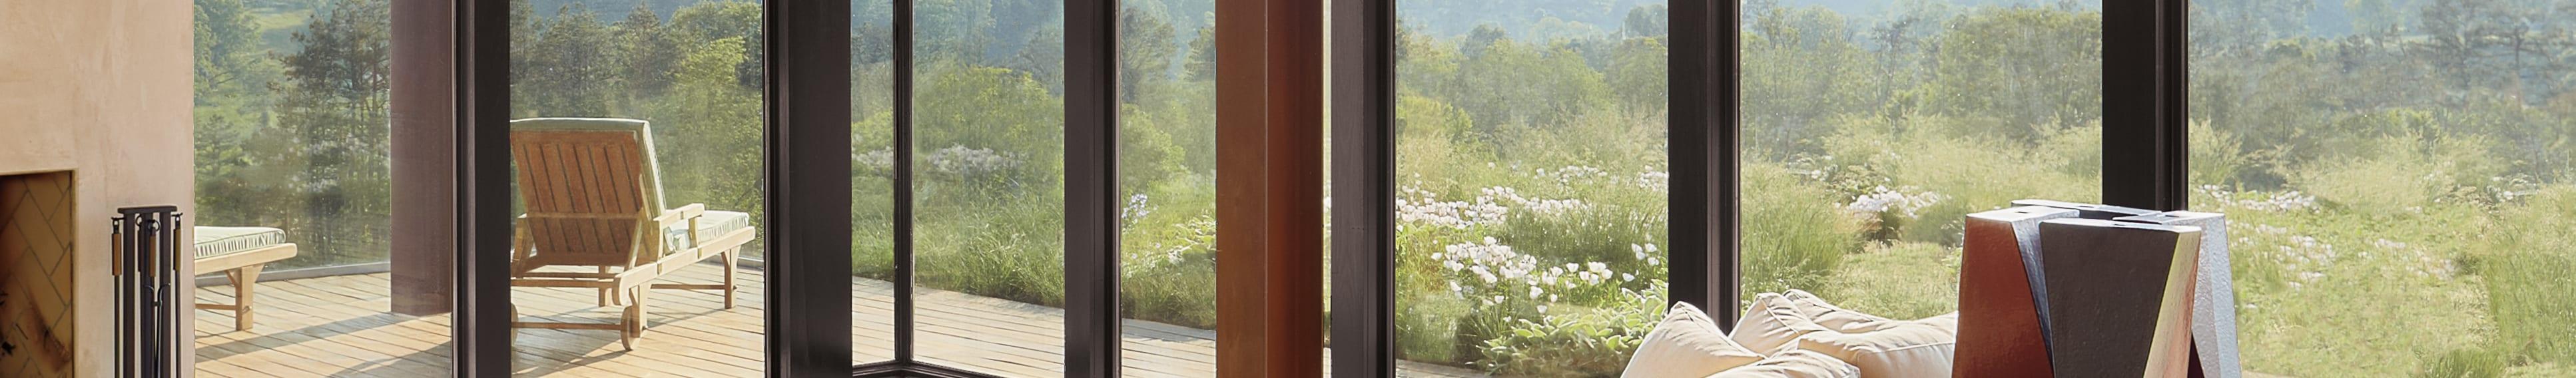 Window showroom window replacement company berkeley for Ashby windows